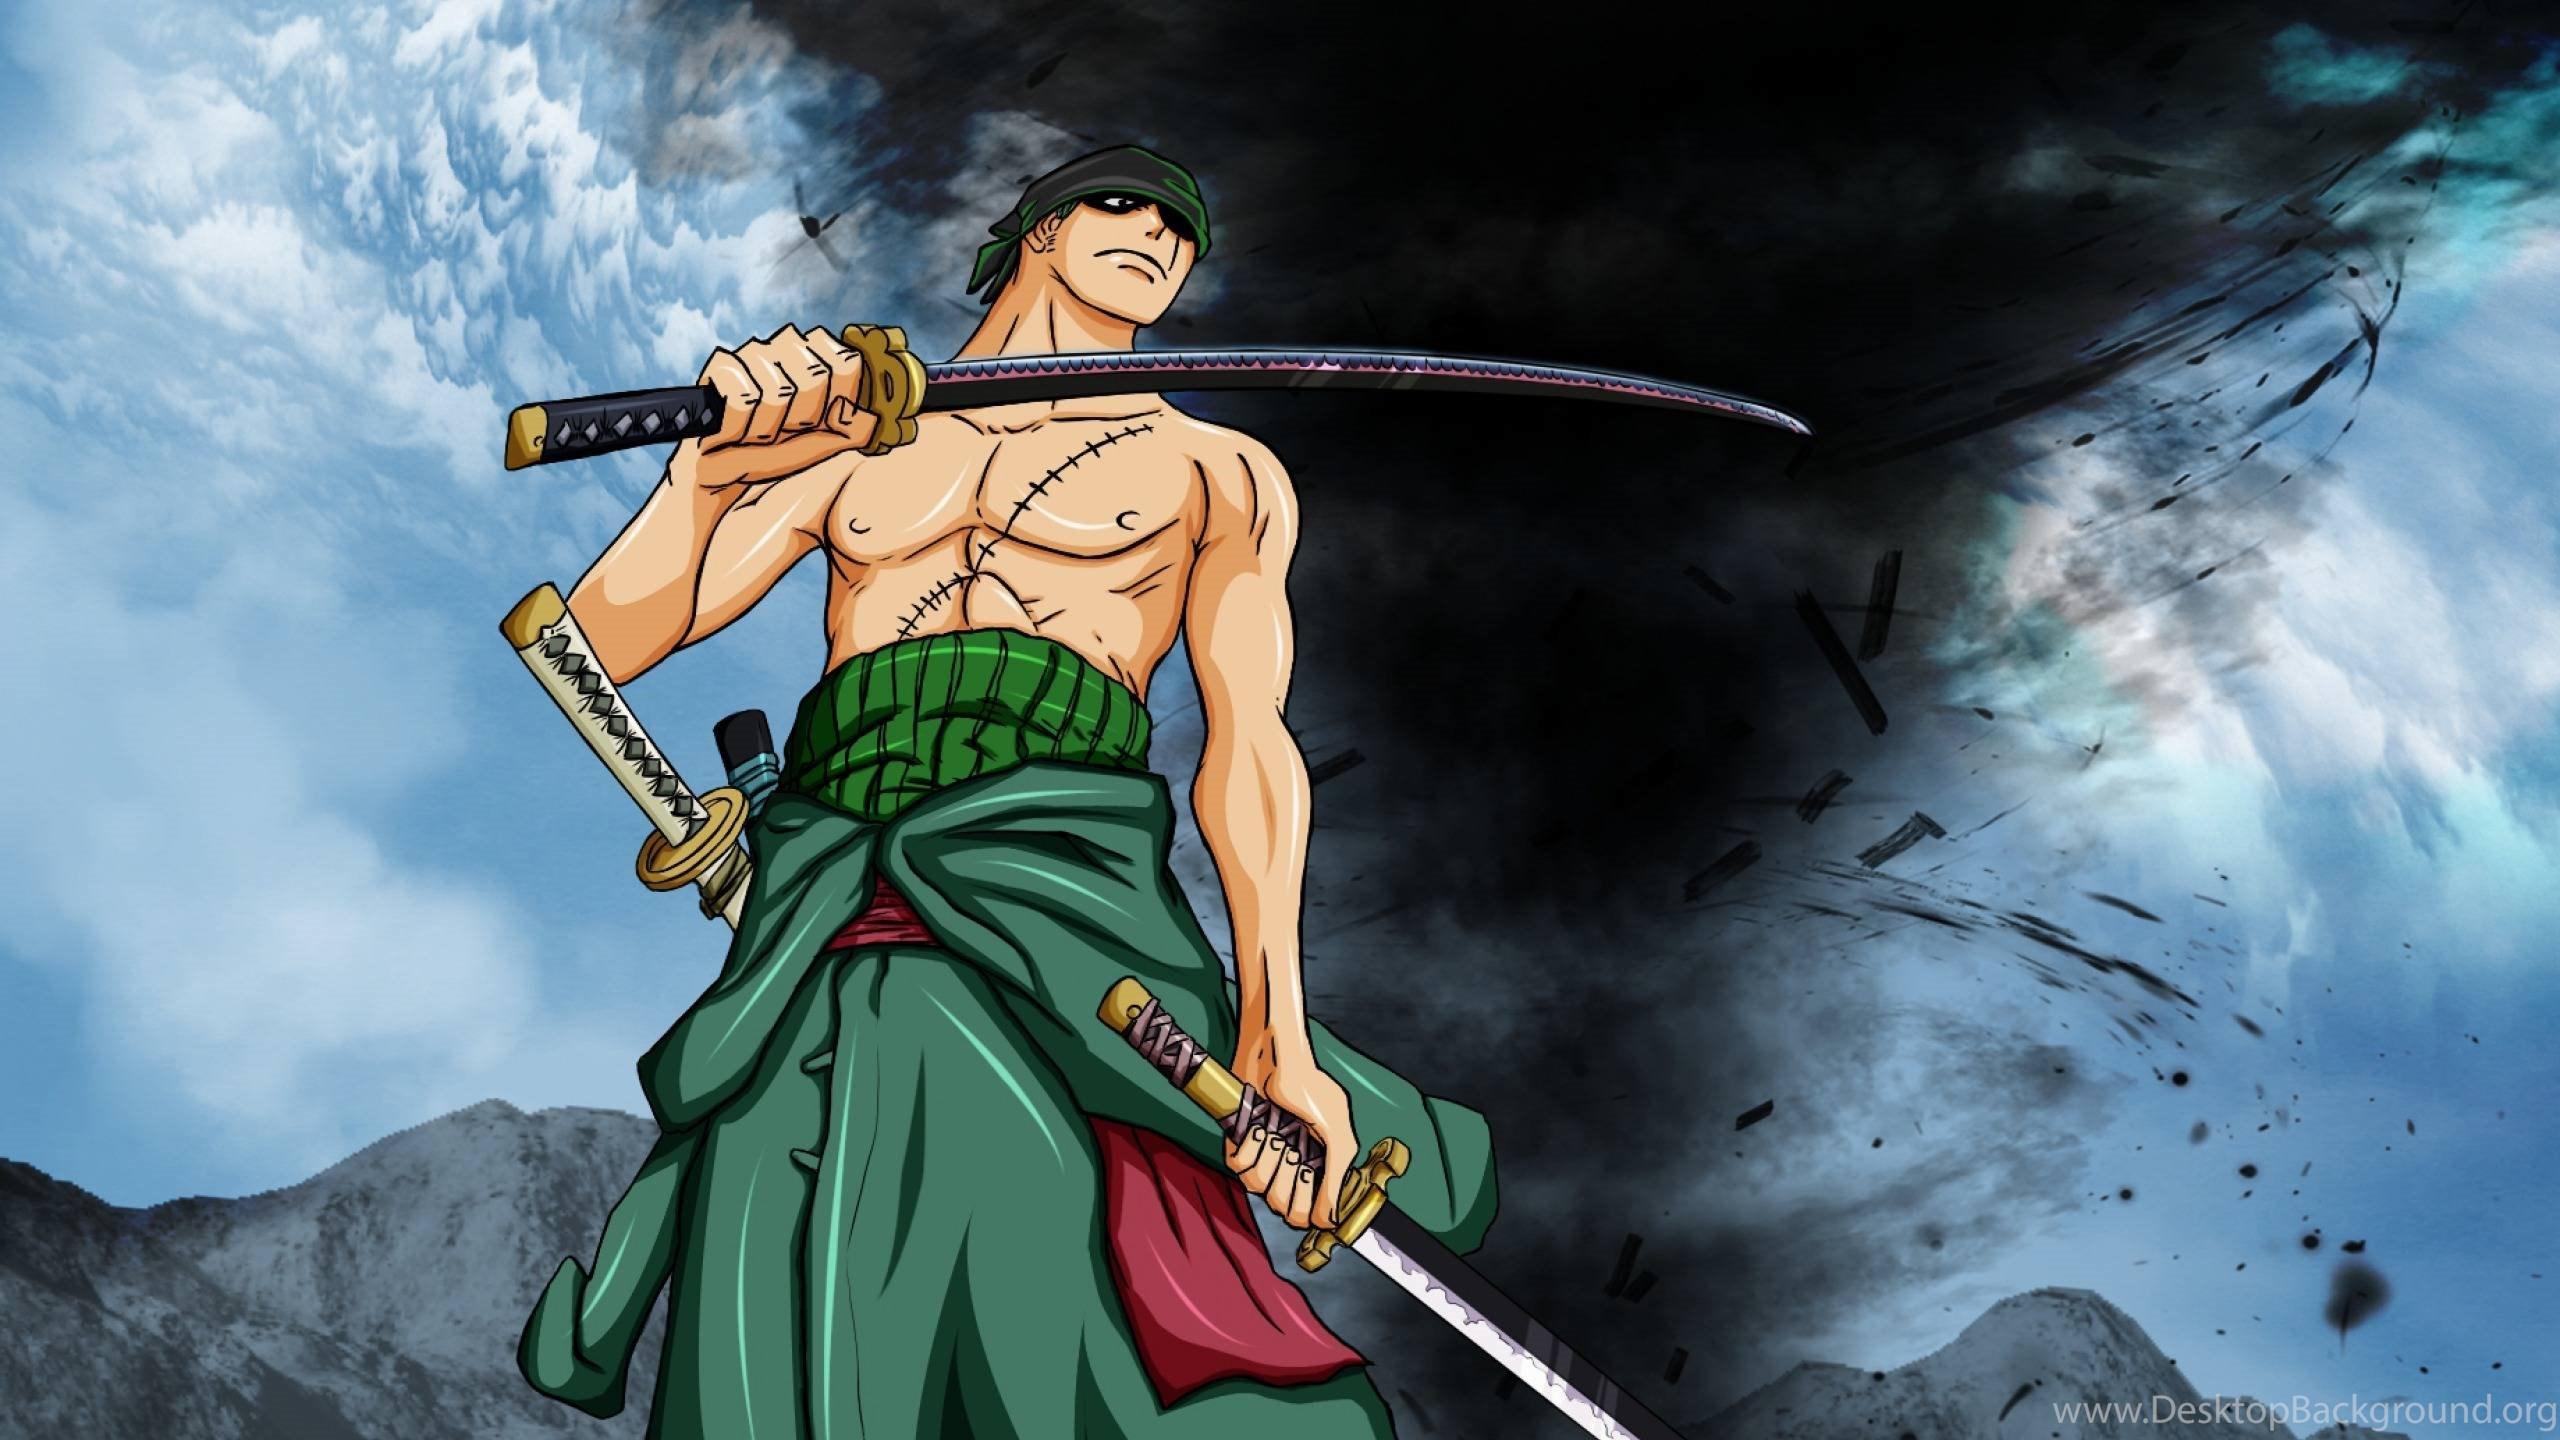 One Piece New World Zoro Full Hd Pics Wallpapers 10553 Hd